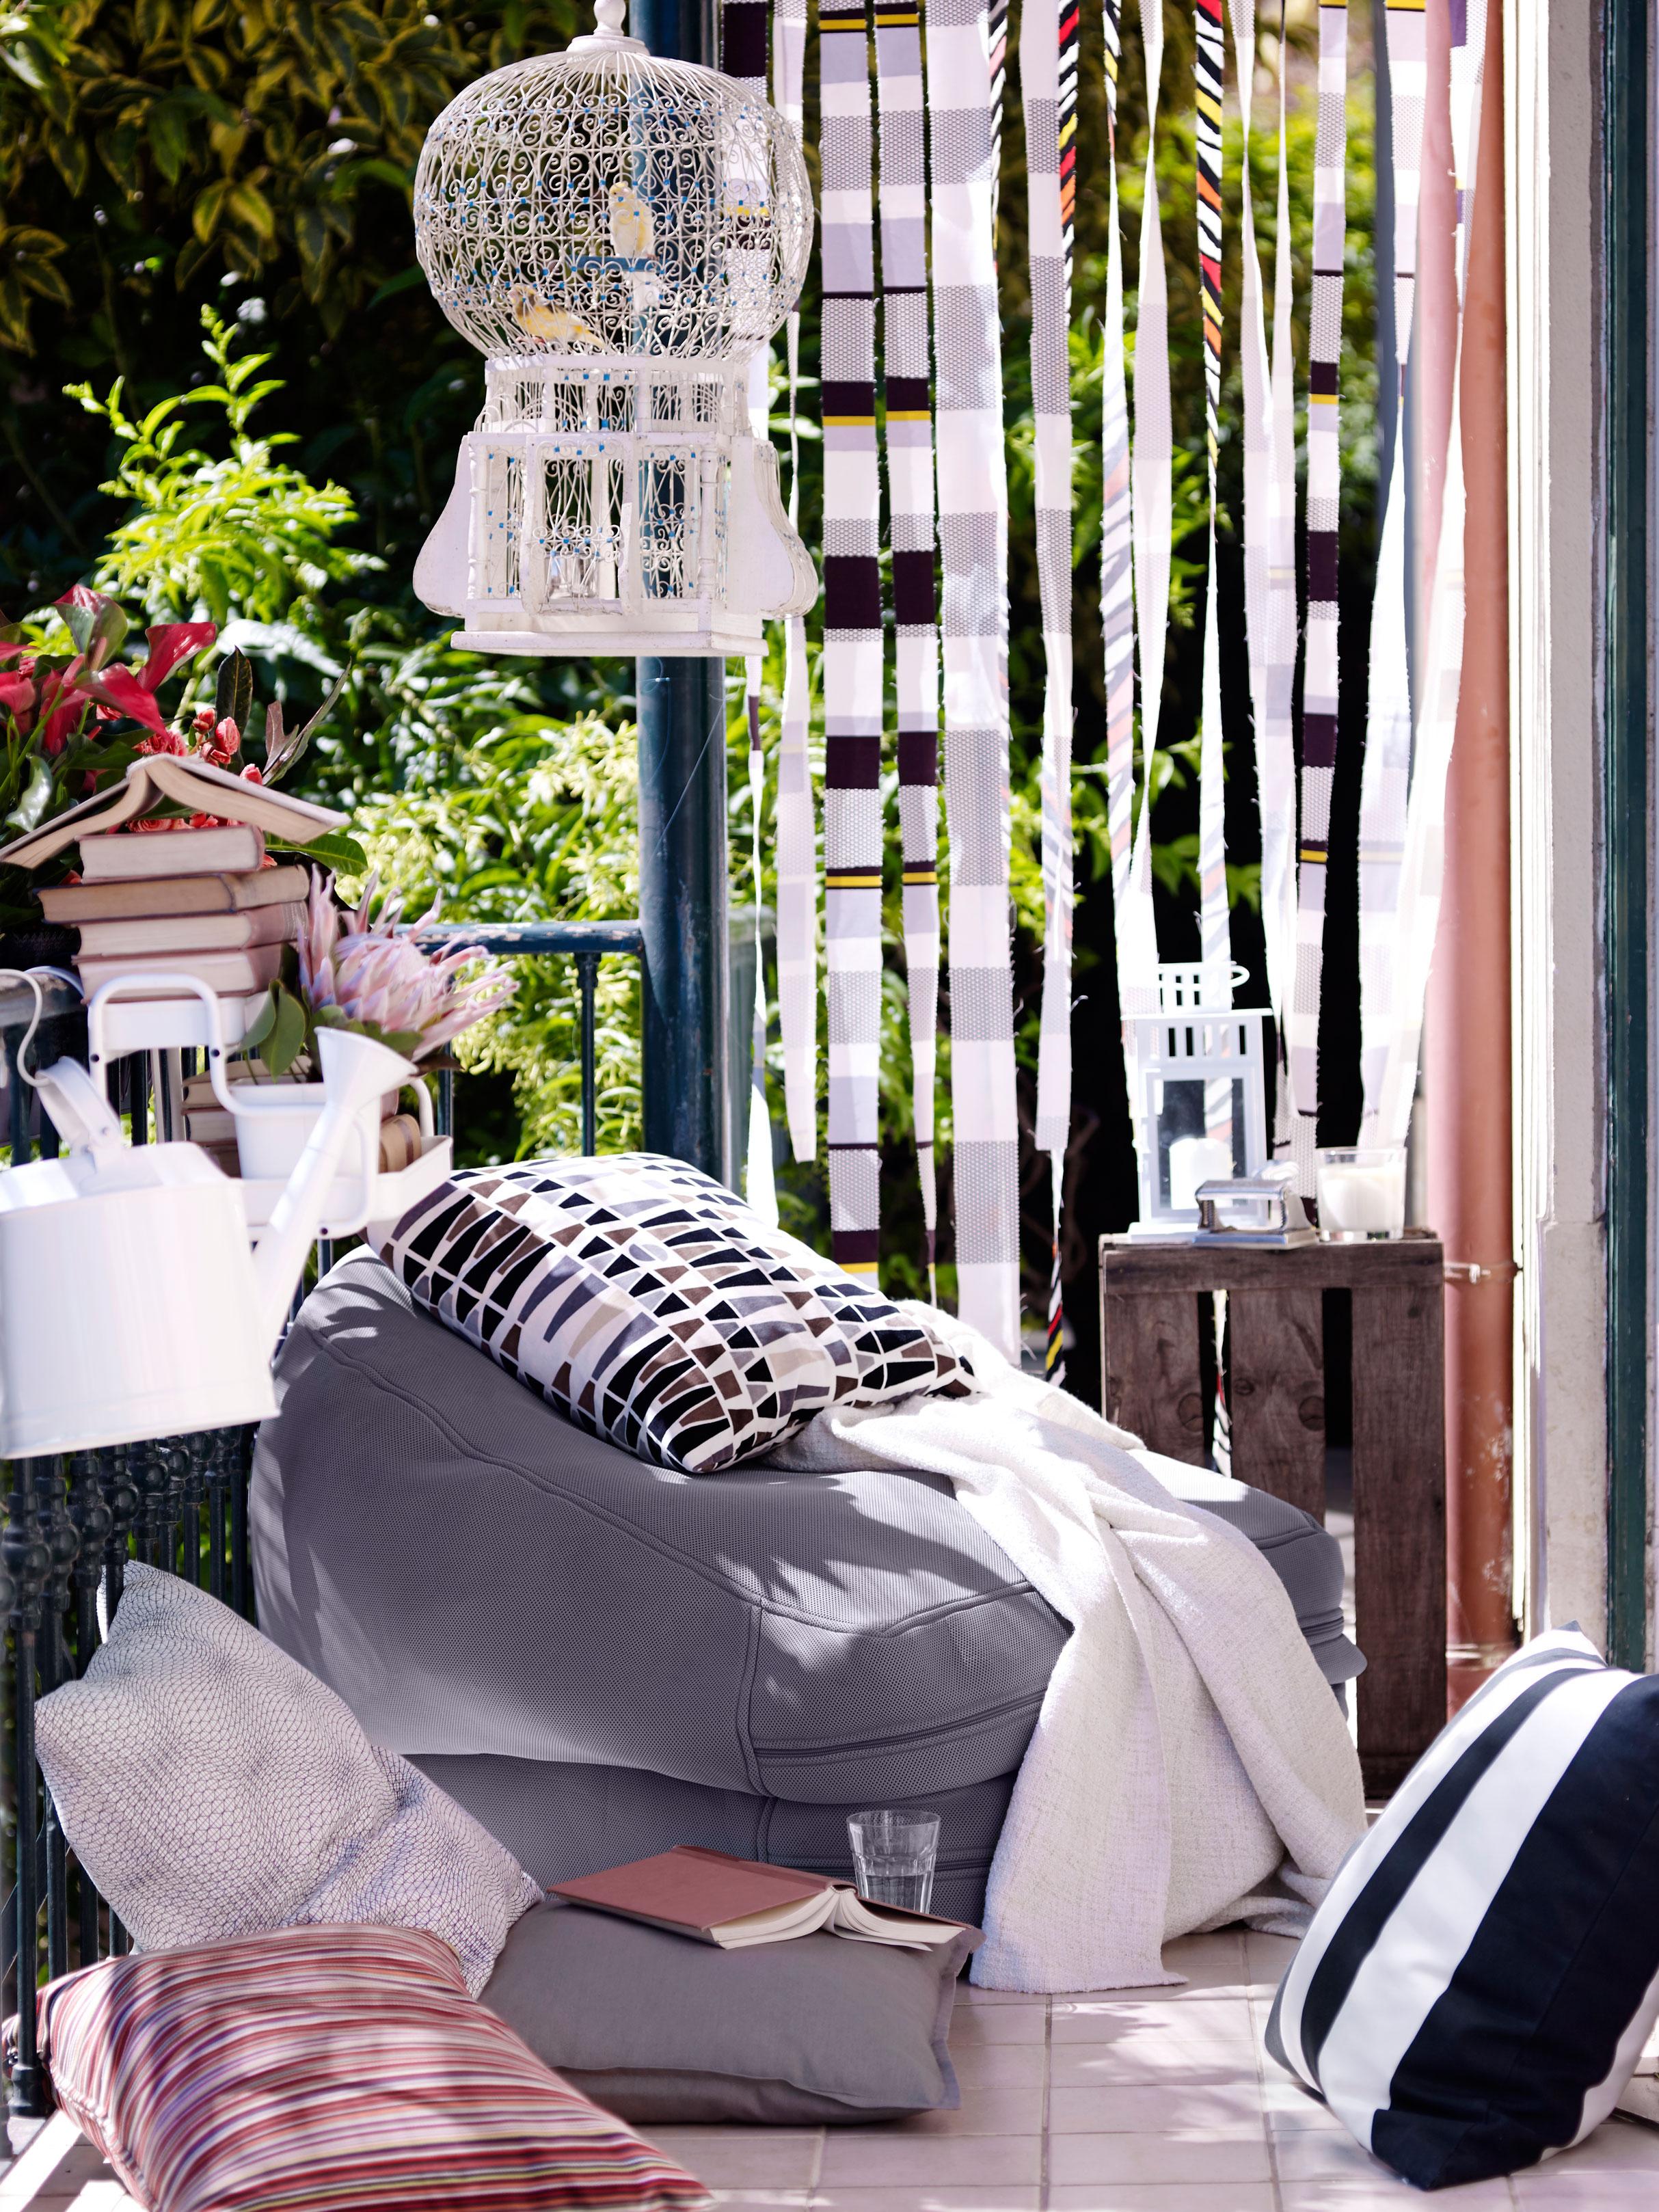 muebles de terraza inspiracin ikea ikea verano diseo exteriores decorar con muebles ikea decoracin balcones with decoracion terrazas ikea